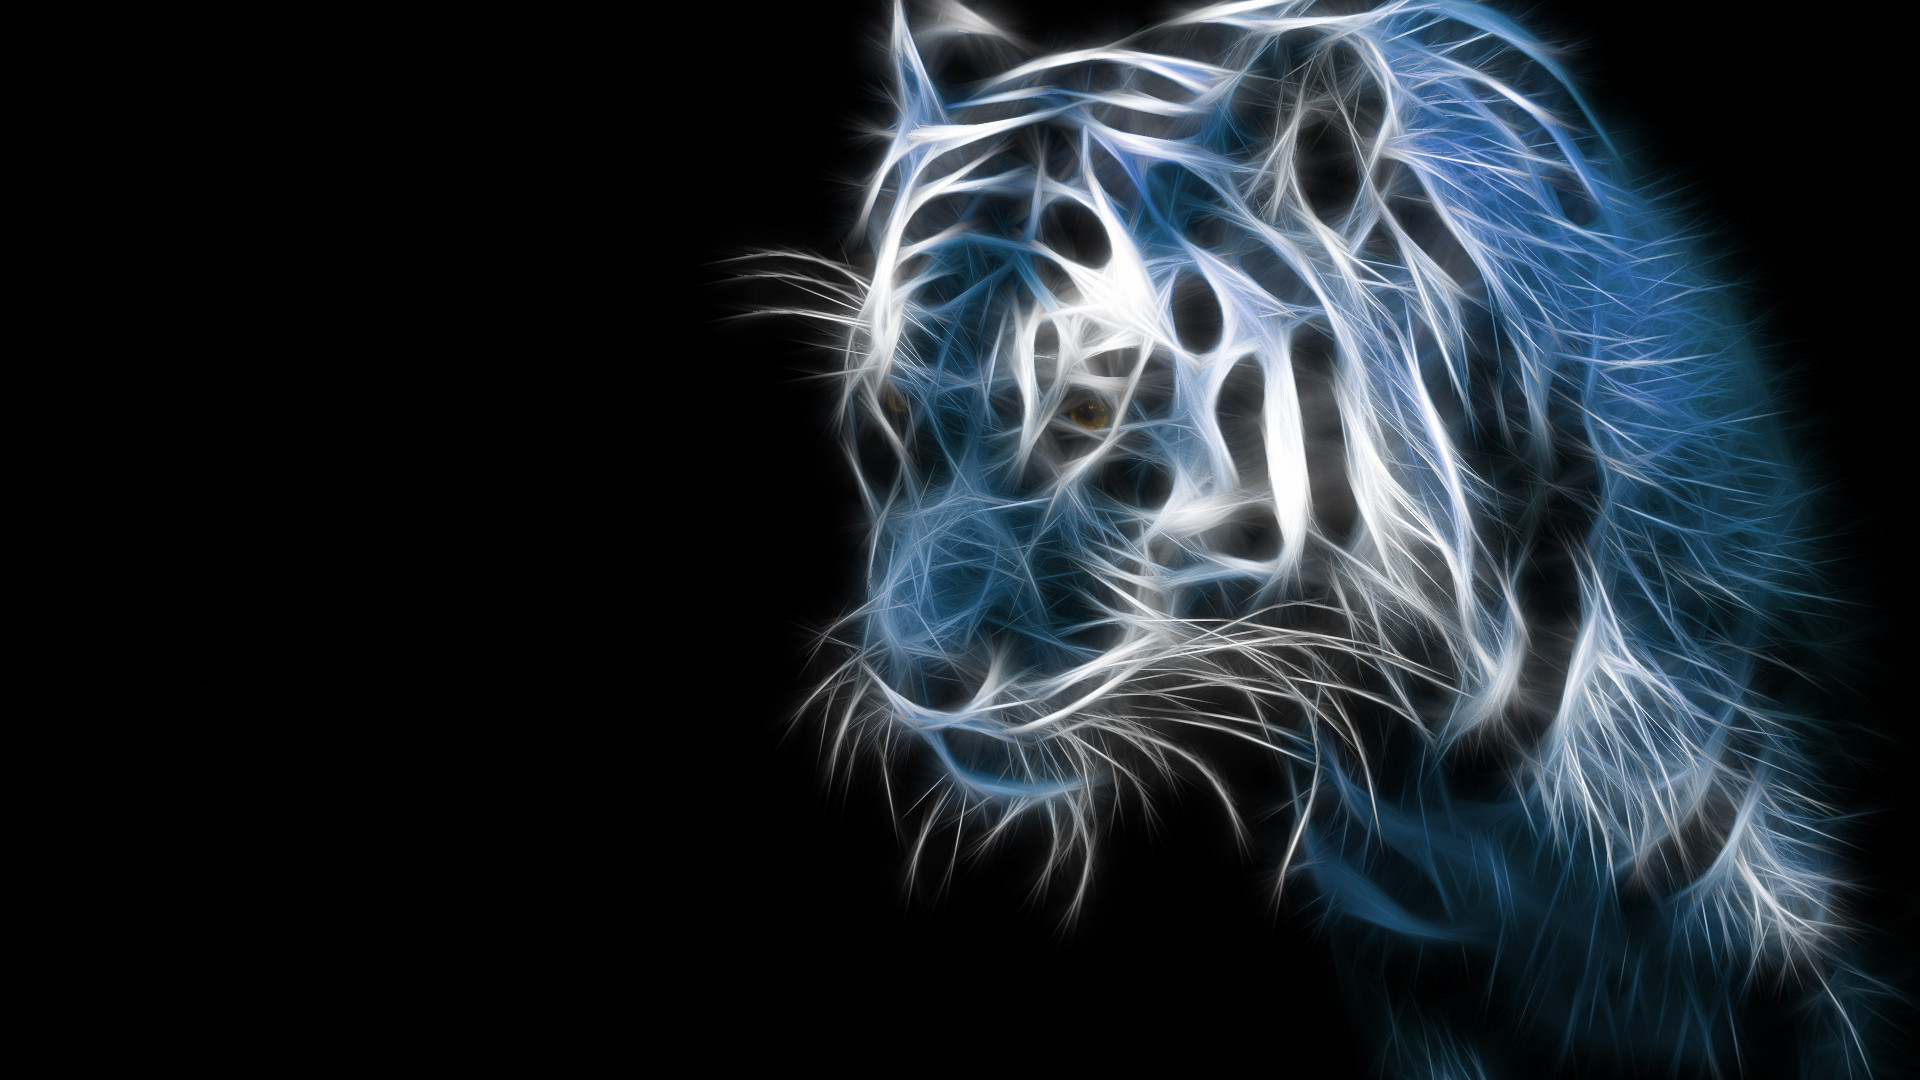 Download Tiger Animal Wallpaper | Full HD Wallpapers